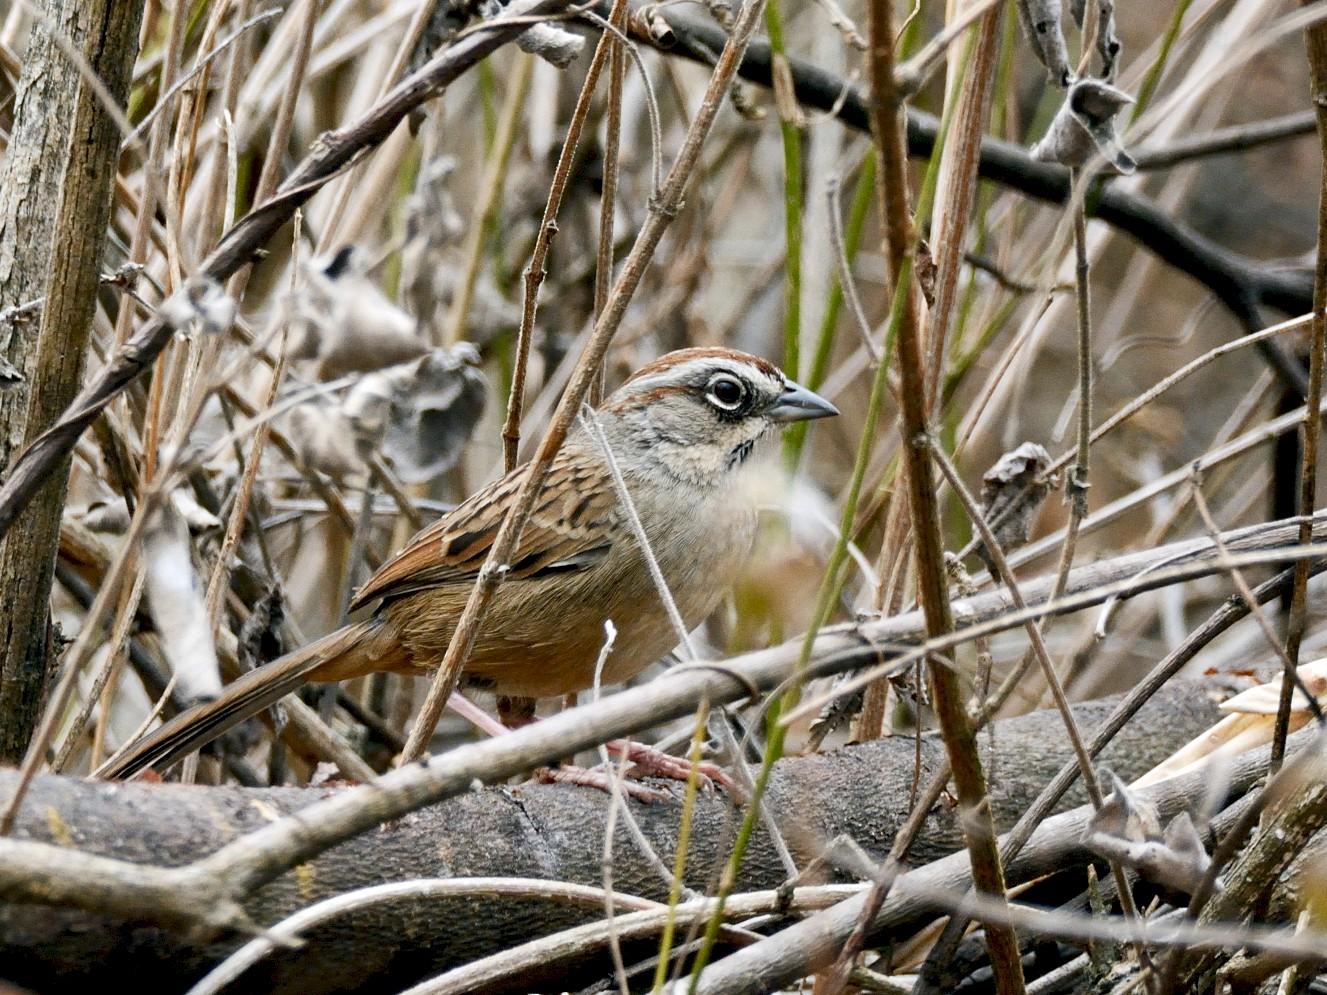 Oaxaca Sparrow - Miguel Angel Aguilar Gomez